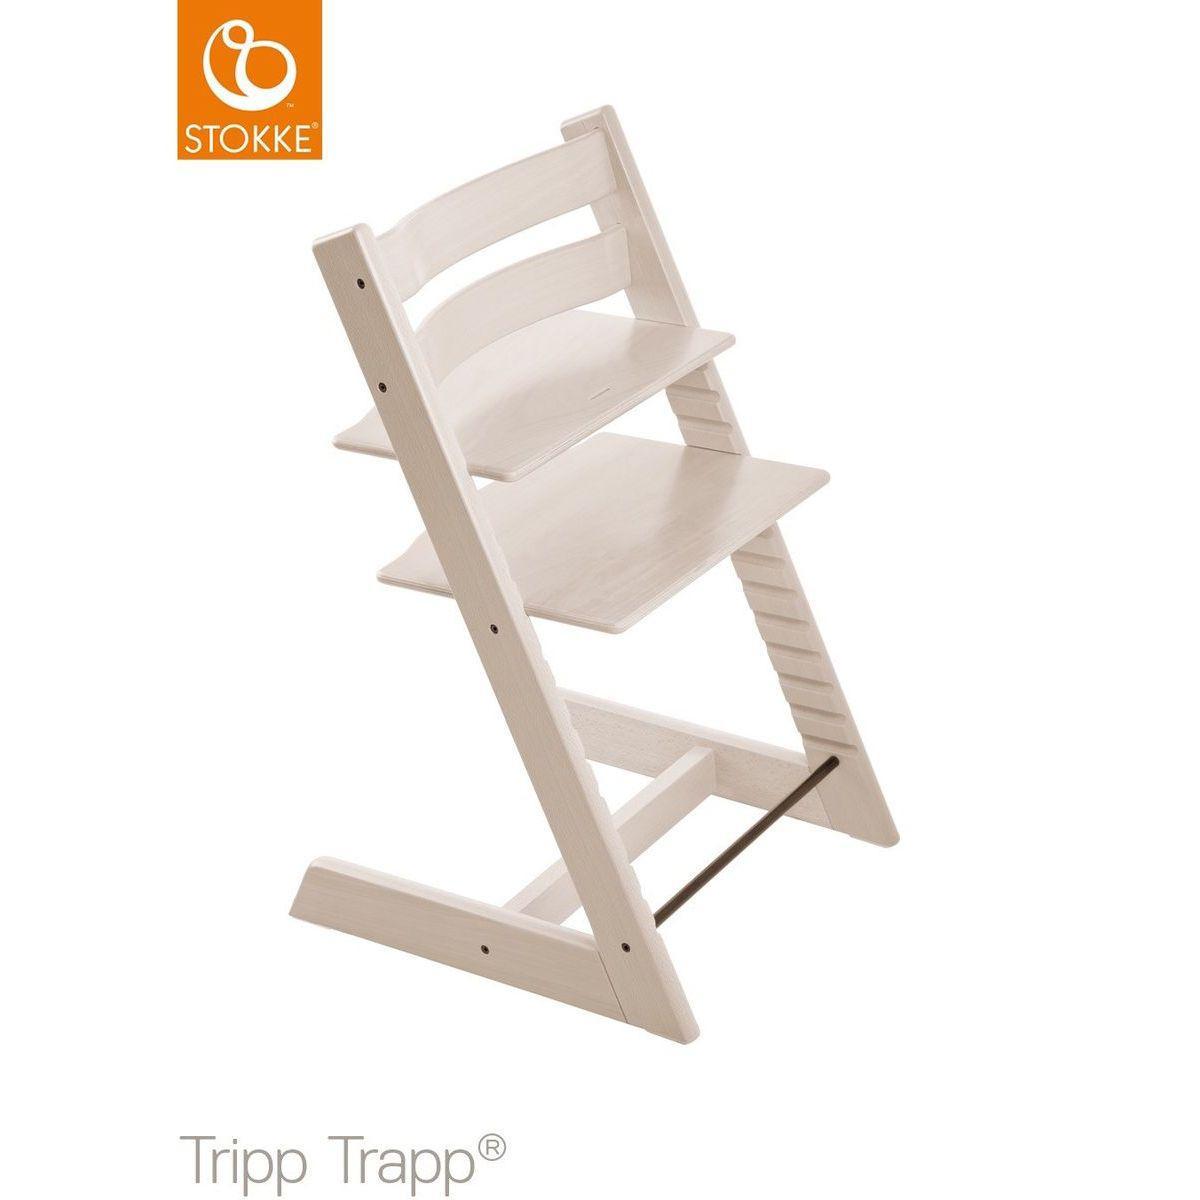 Chaise haute TRIPP TRAPP Stokke blanchi